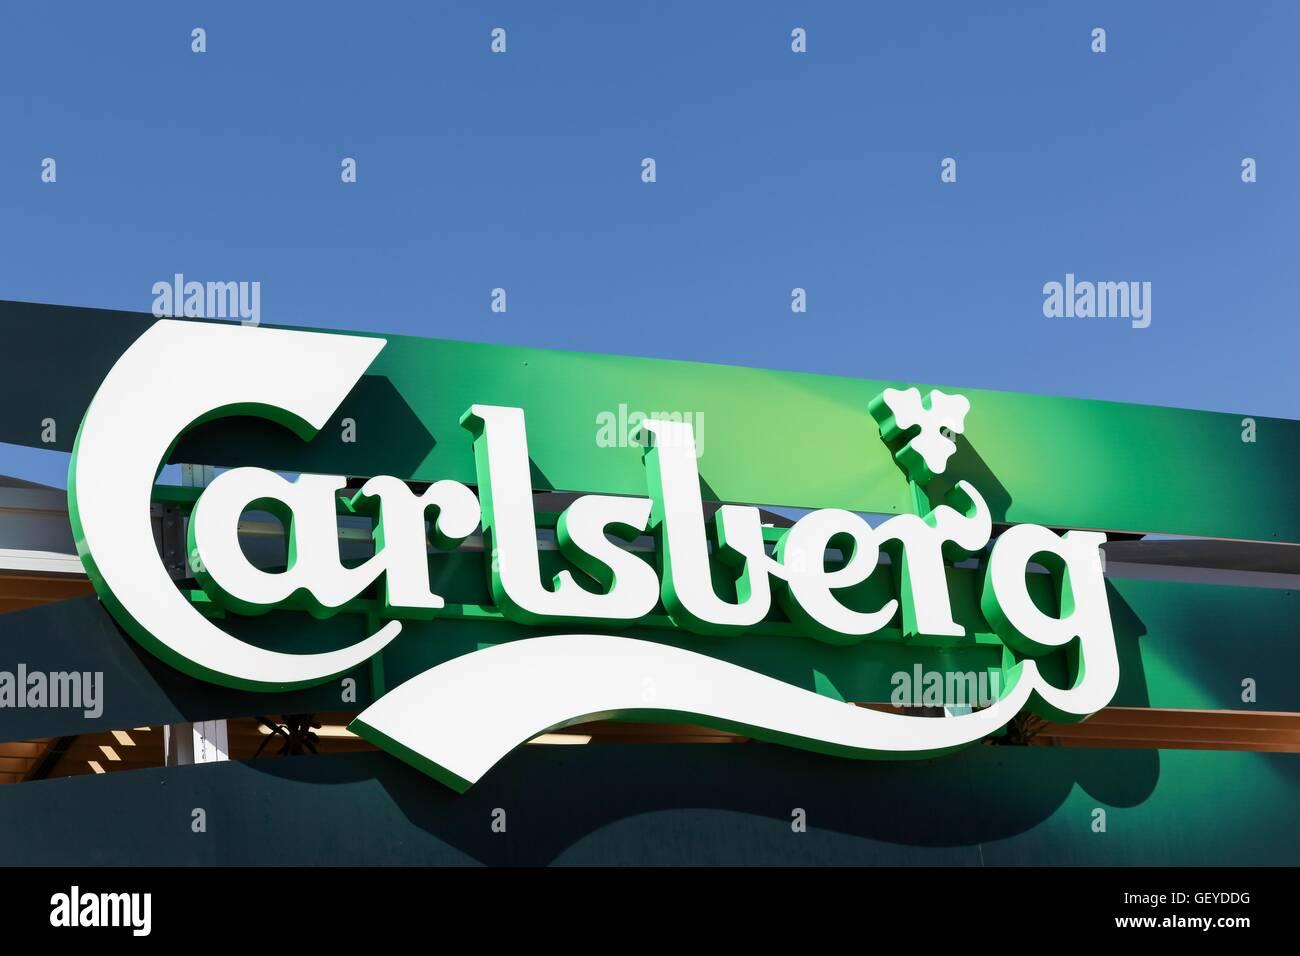 Carlsberg logo on a wall - Stock Image